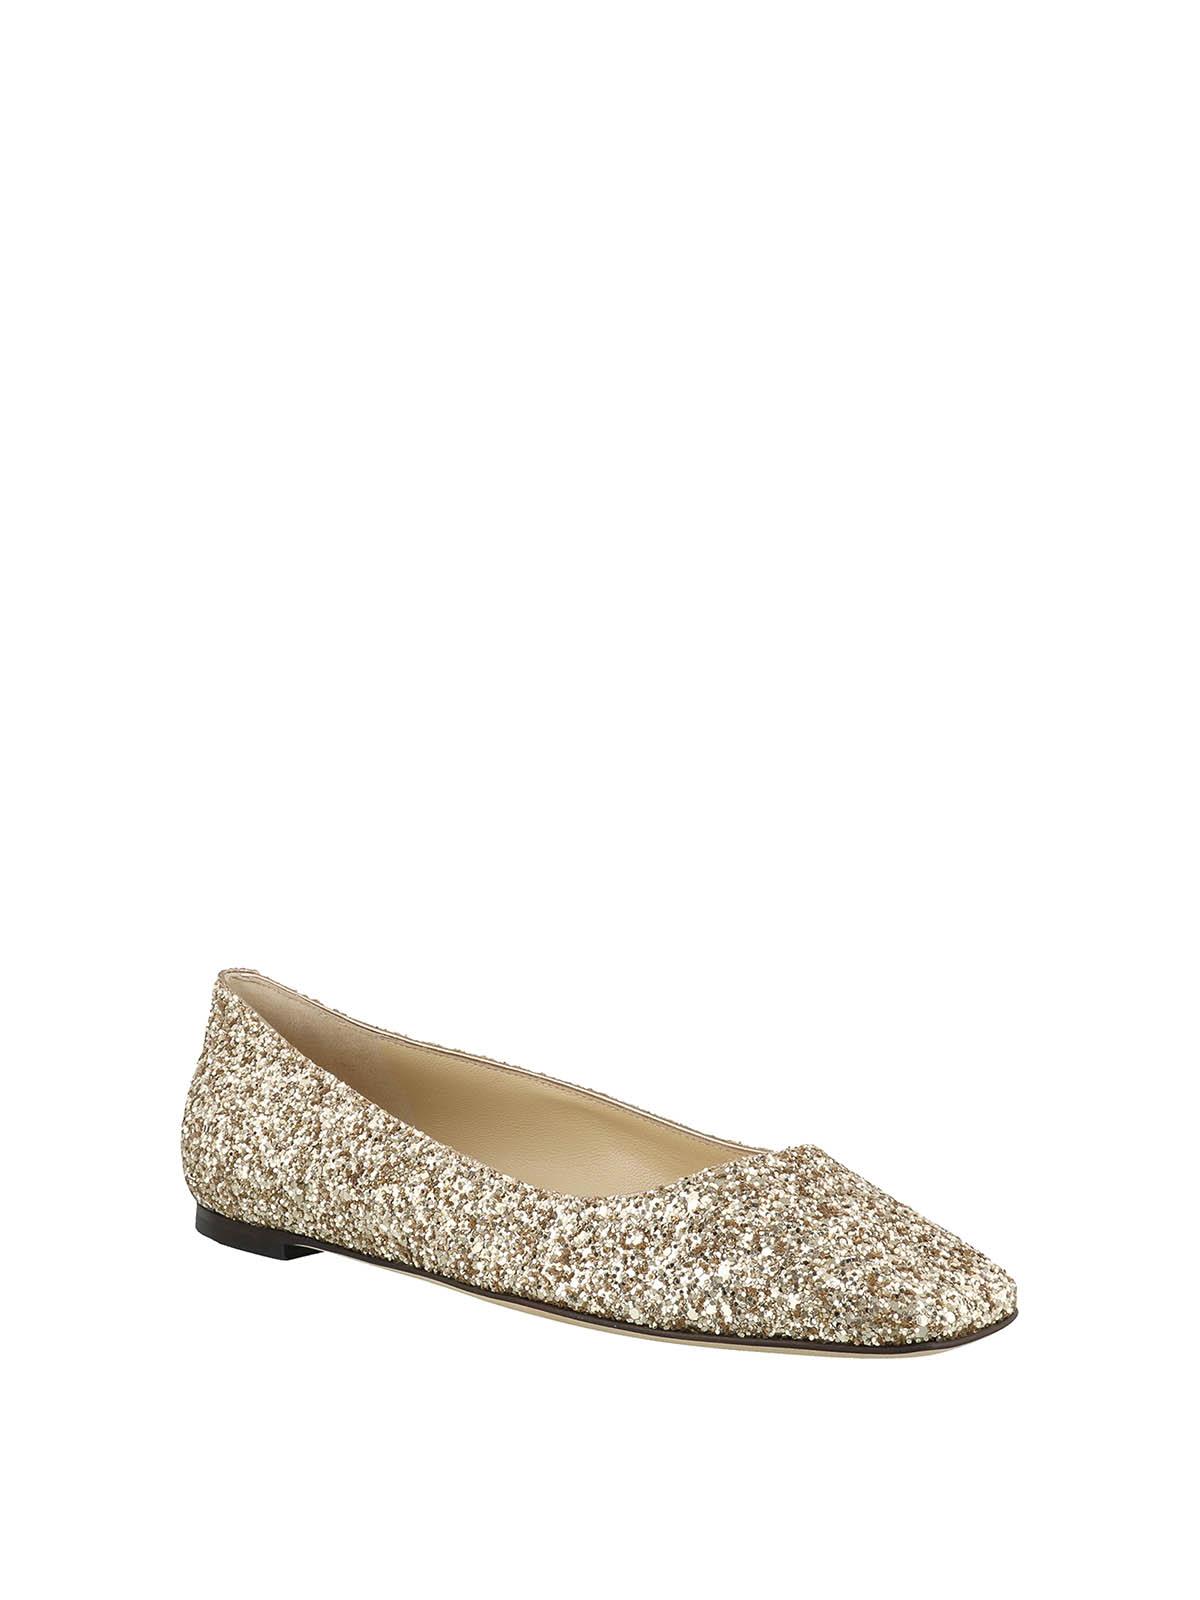 Jimmy Choo - Mirele Flat gold glitter flats - flat shoes -  MIRELEFLATWGBGOLDIE